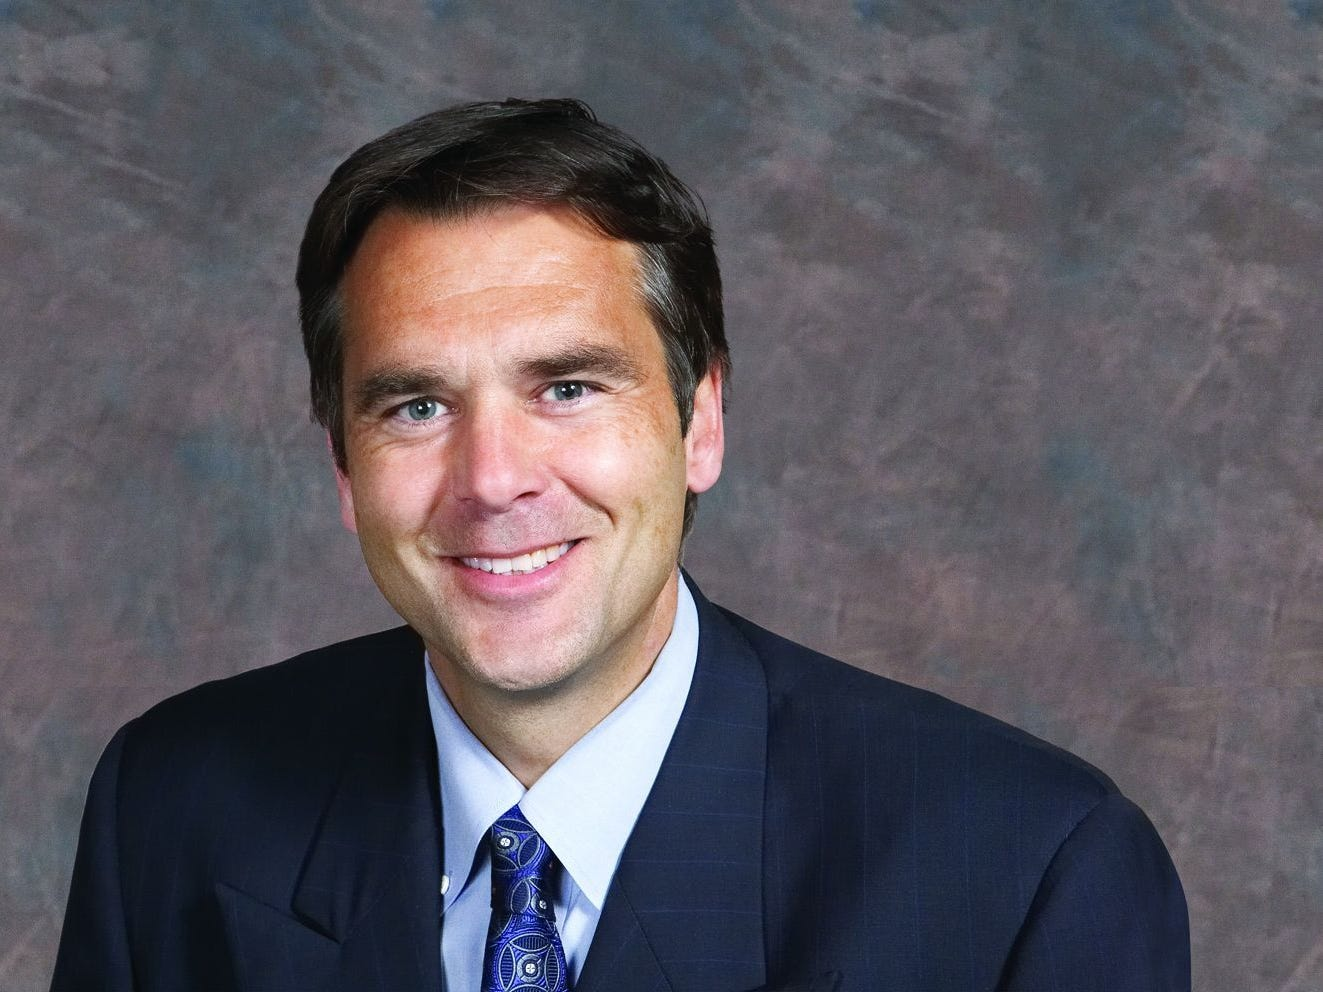 Healthcare Trust of America Inc.'s Scott Peters: Summary compensation: $8,490,974. Adjusted compensation: $7,954,925. TTM profit: $60 million. TTM revenue: $664 million. 2017 stock: 7.4 percent. Capitalization: $5.5 billion.